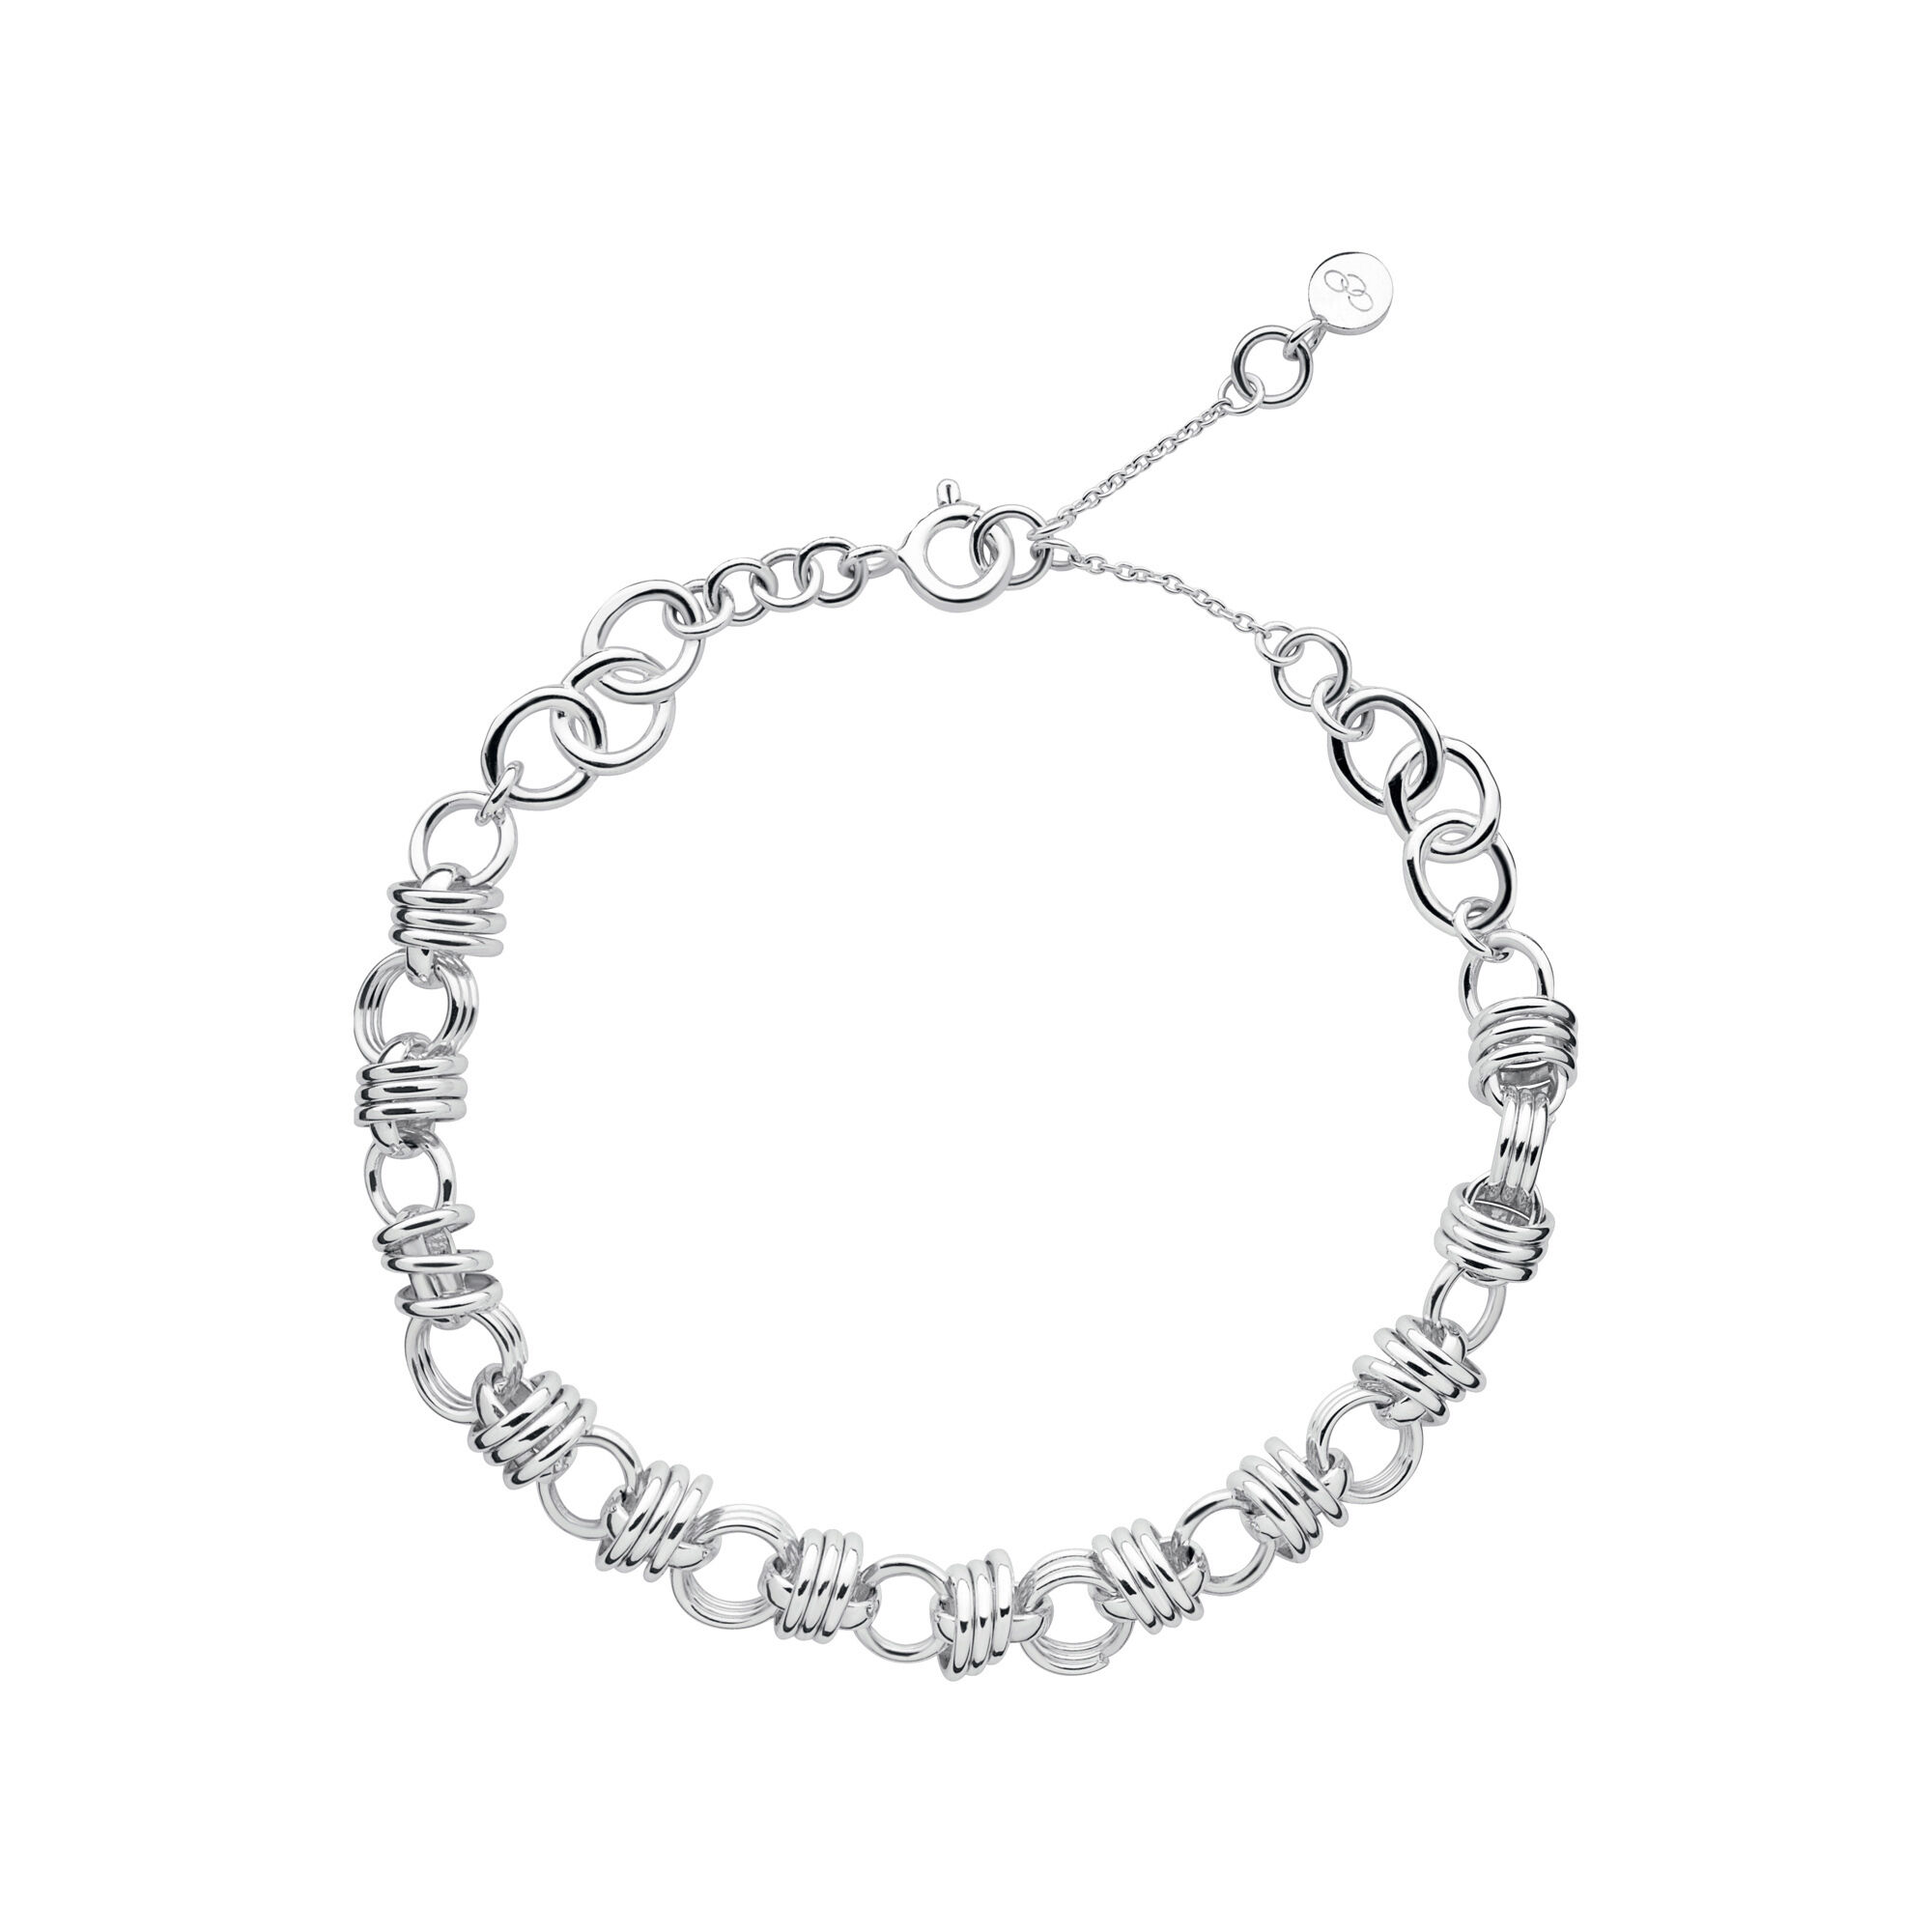 Sweetie XS Silver Chain Charm Bracelet